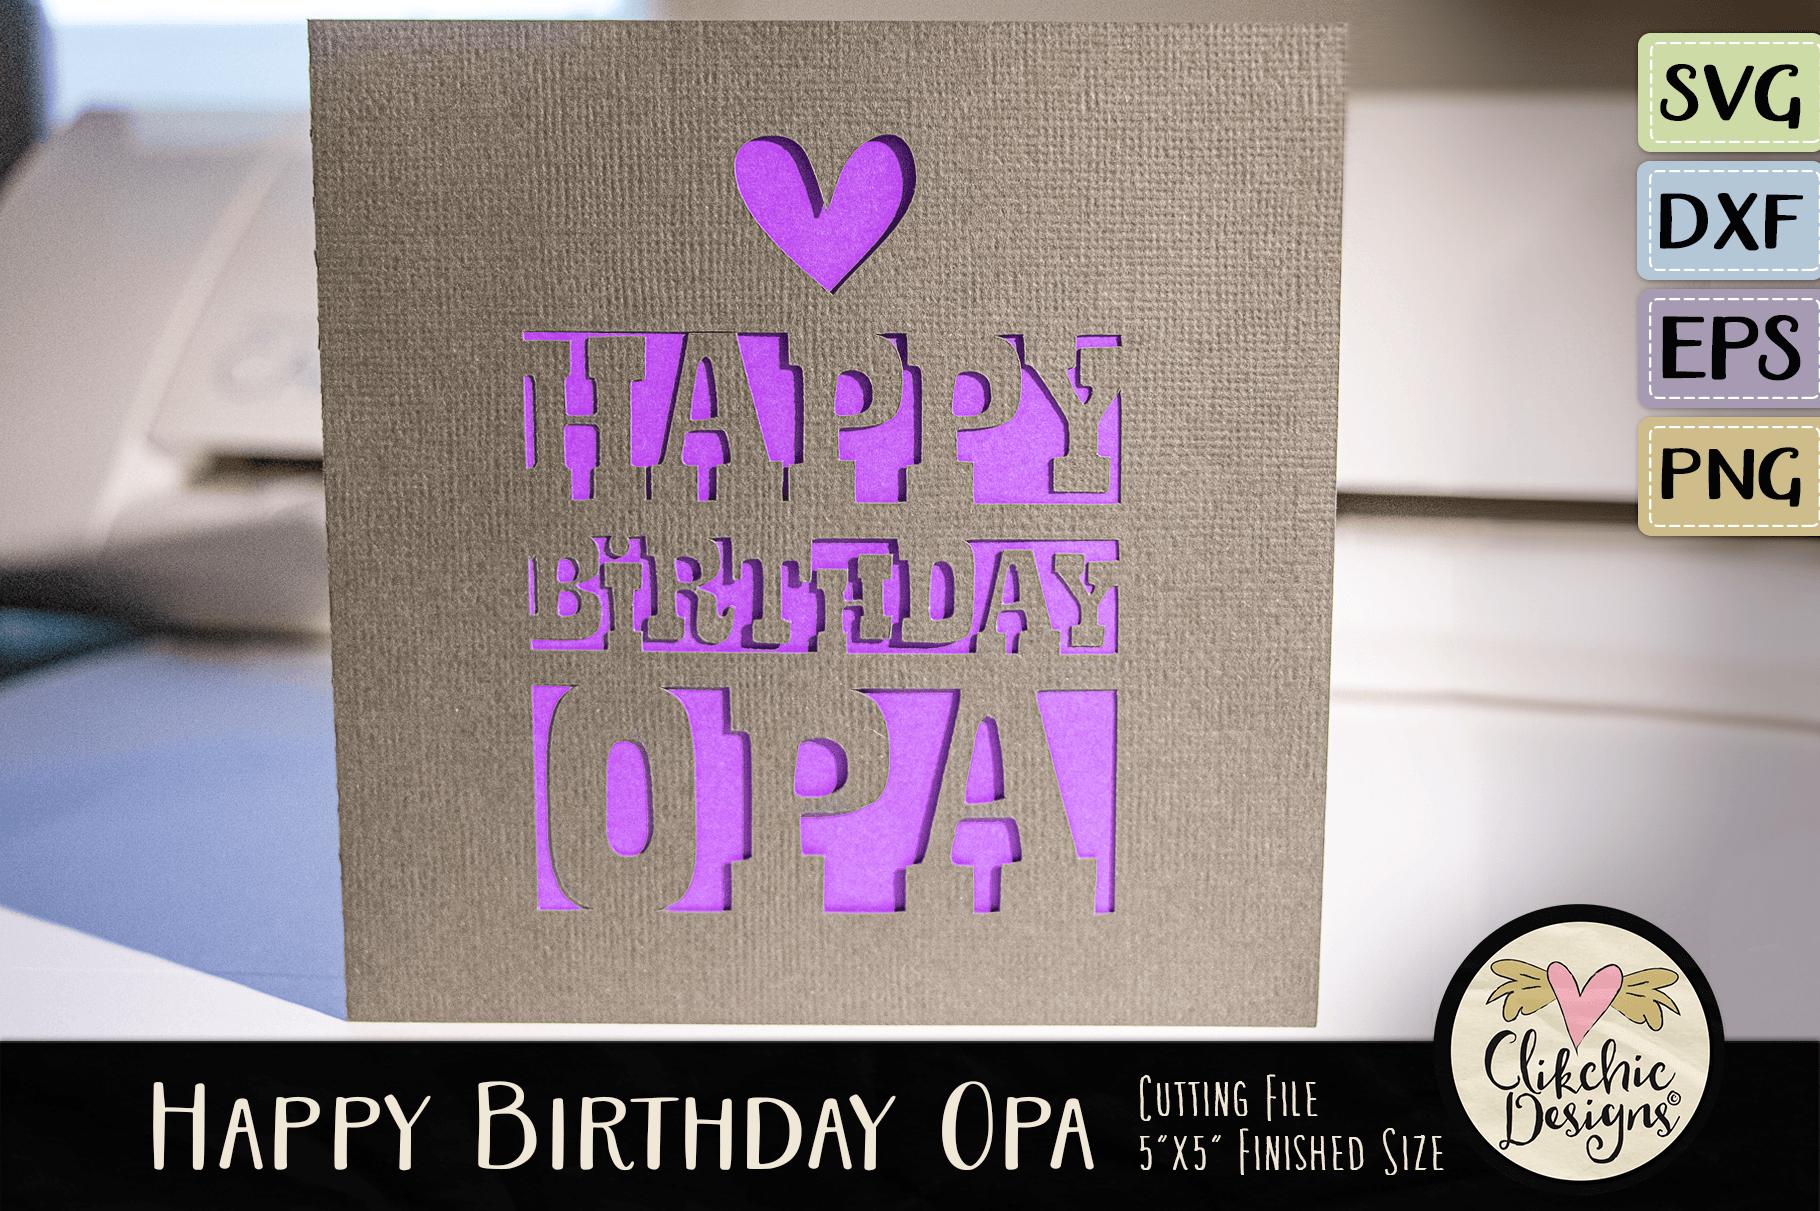 Happy Birthday Opa Card Svg Cutting File By Clikchic Designs